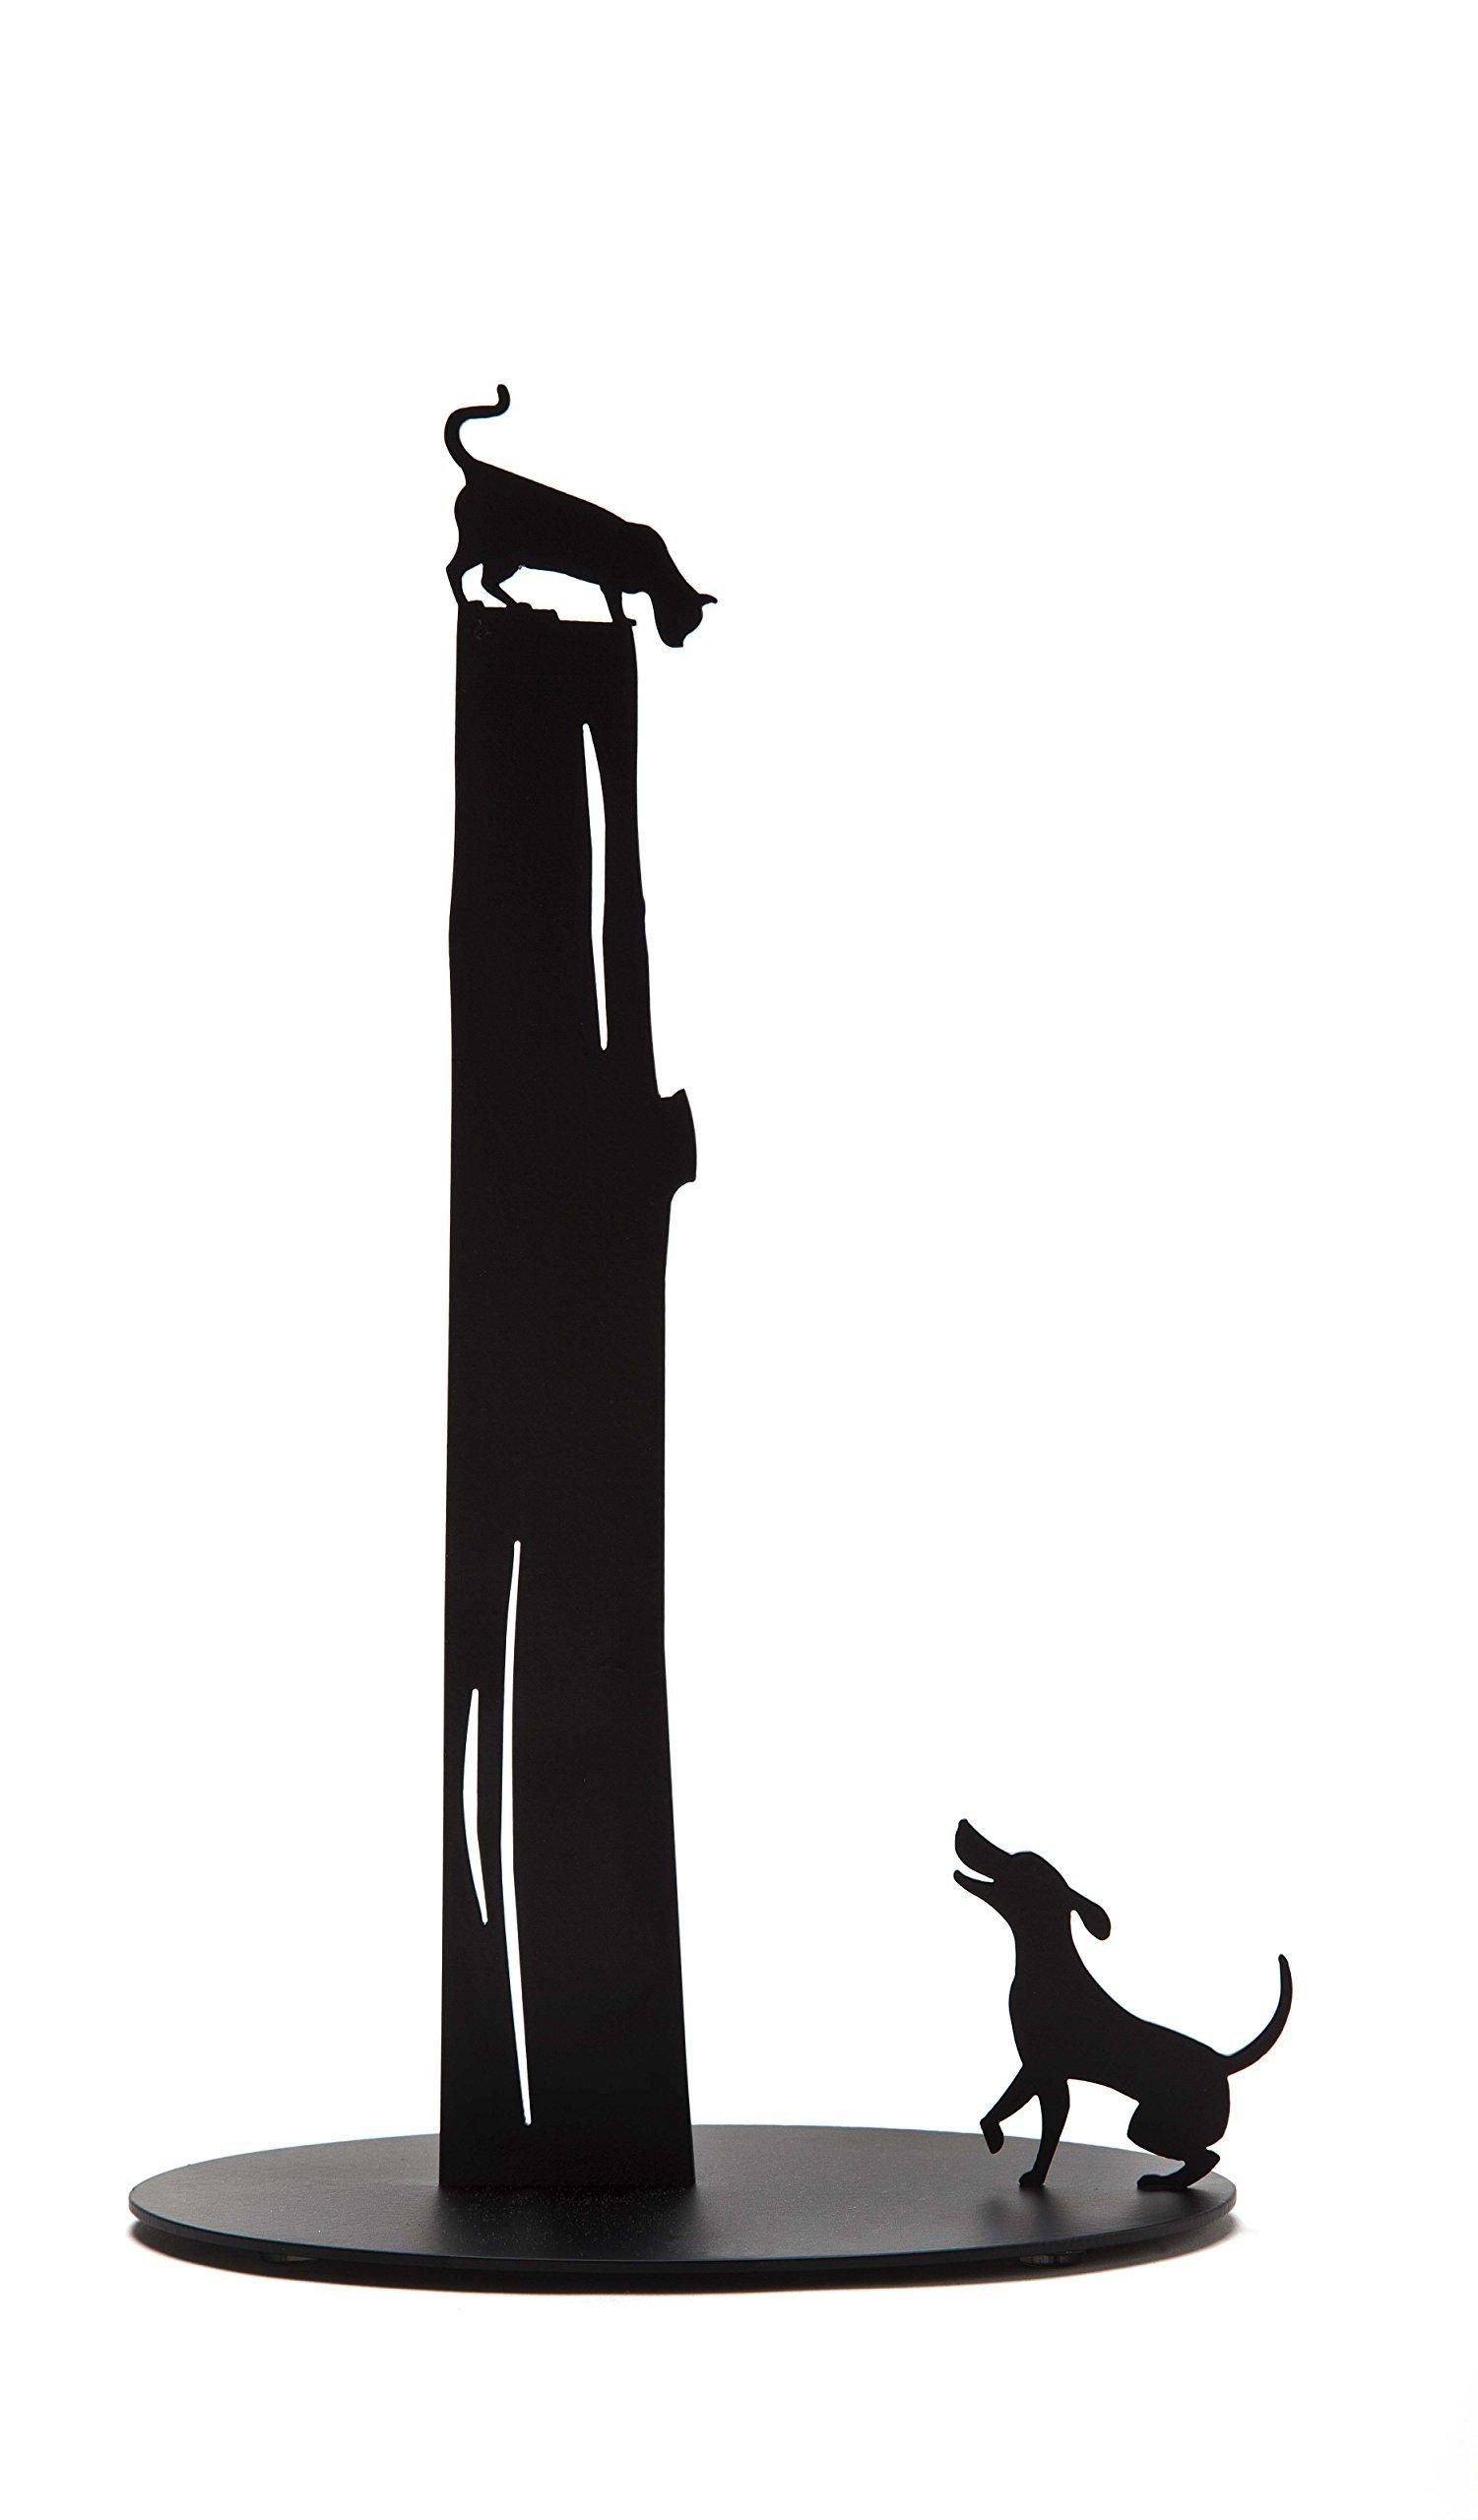 ARTORI Design Black Cat and Dog Paper Towel Stand Cute Design Rack by ARTORI Design